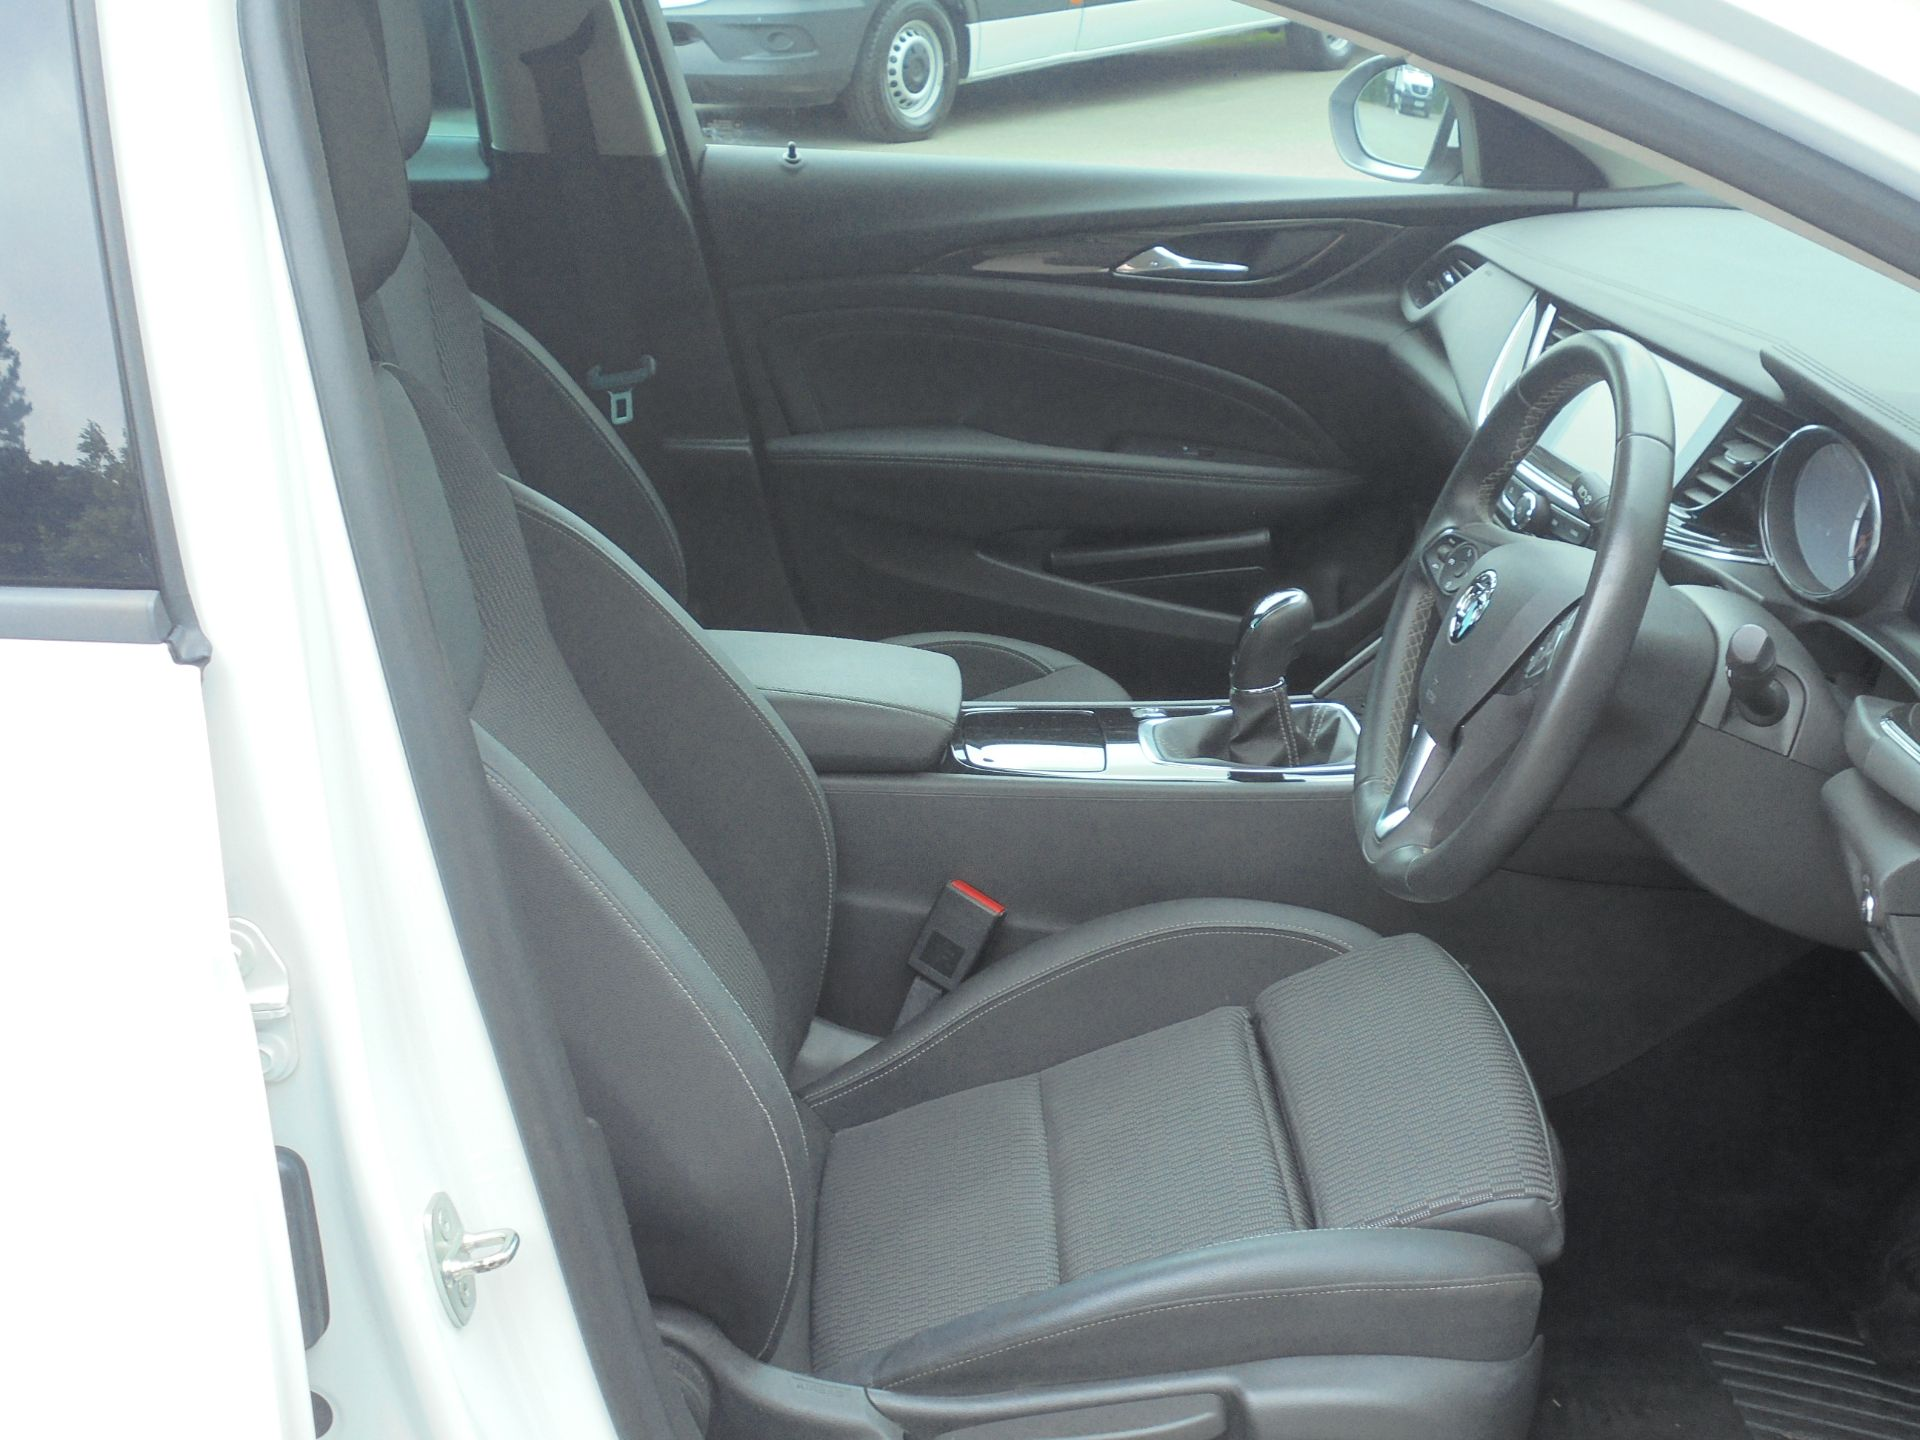 2018 Vauxhall Insignia 1.6 Grand Sport Turbo D Ecotec [136] Sri Nav 5Dr (VU18DFG) Image 13